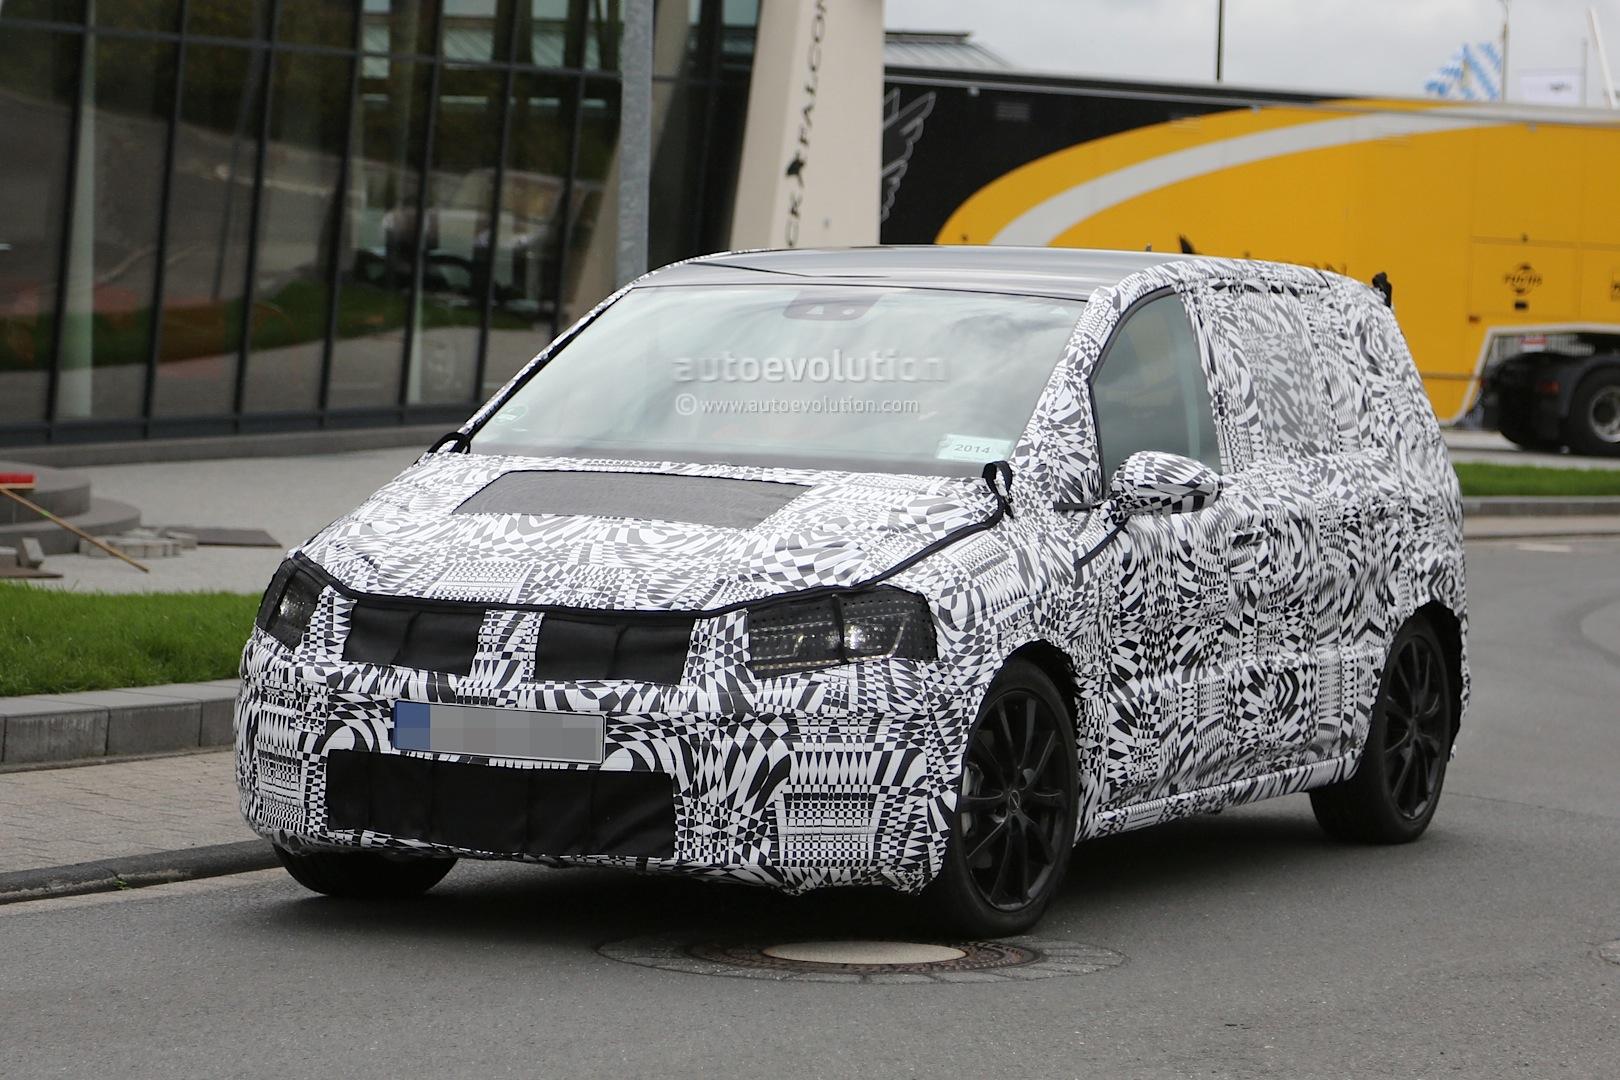 2015 Volkswagen Touran Spied with LED Headlights - autoevolution